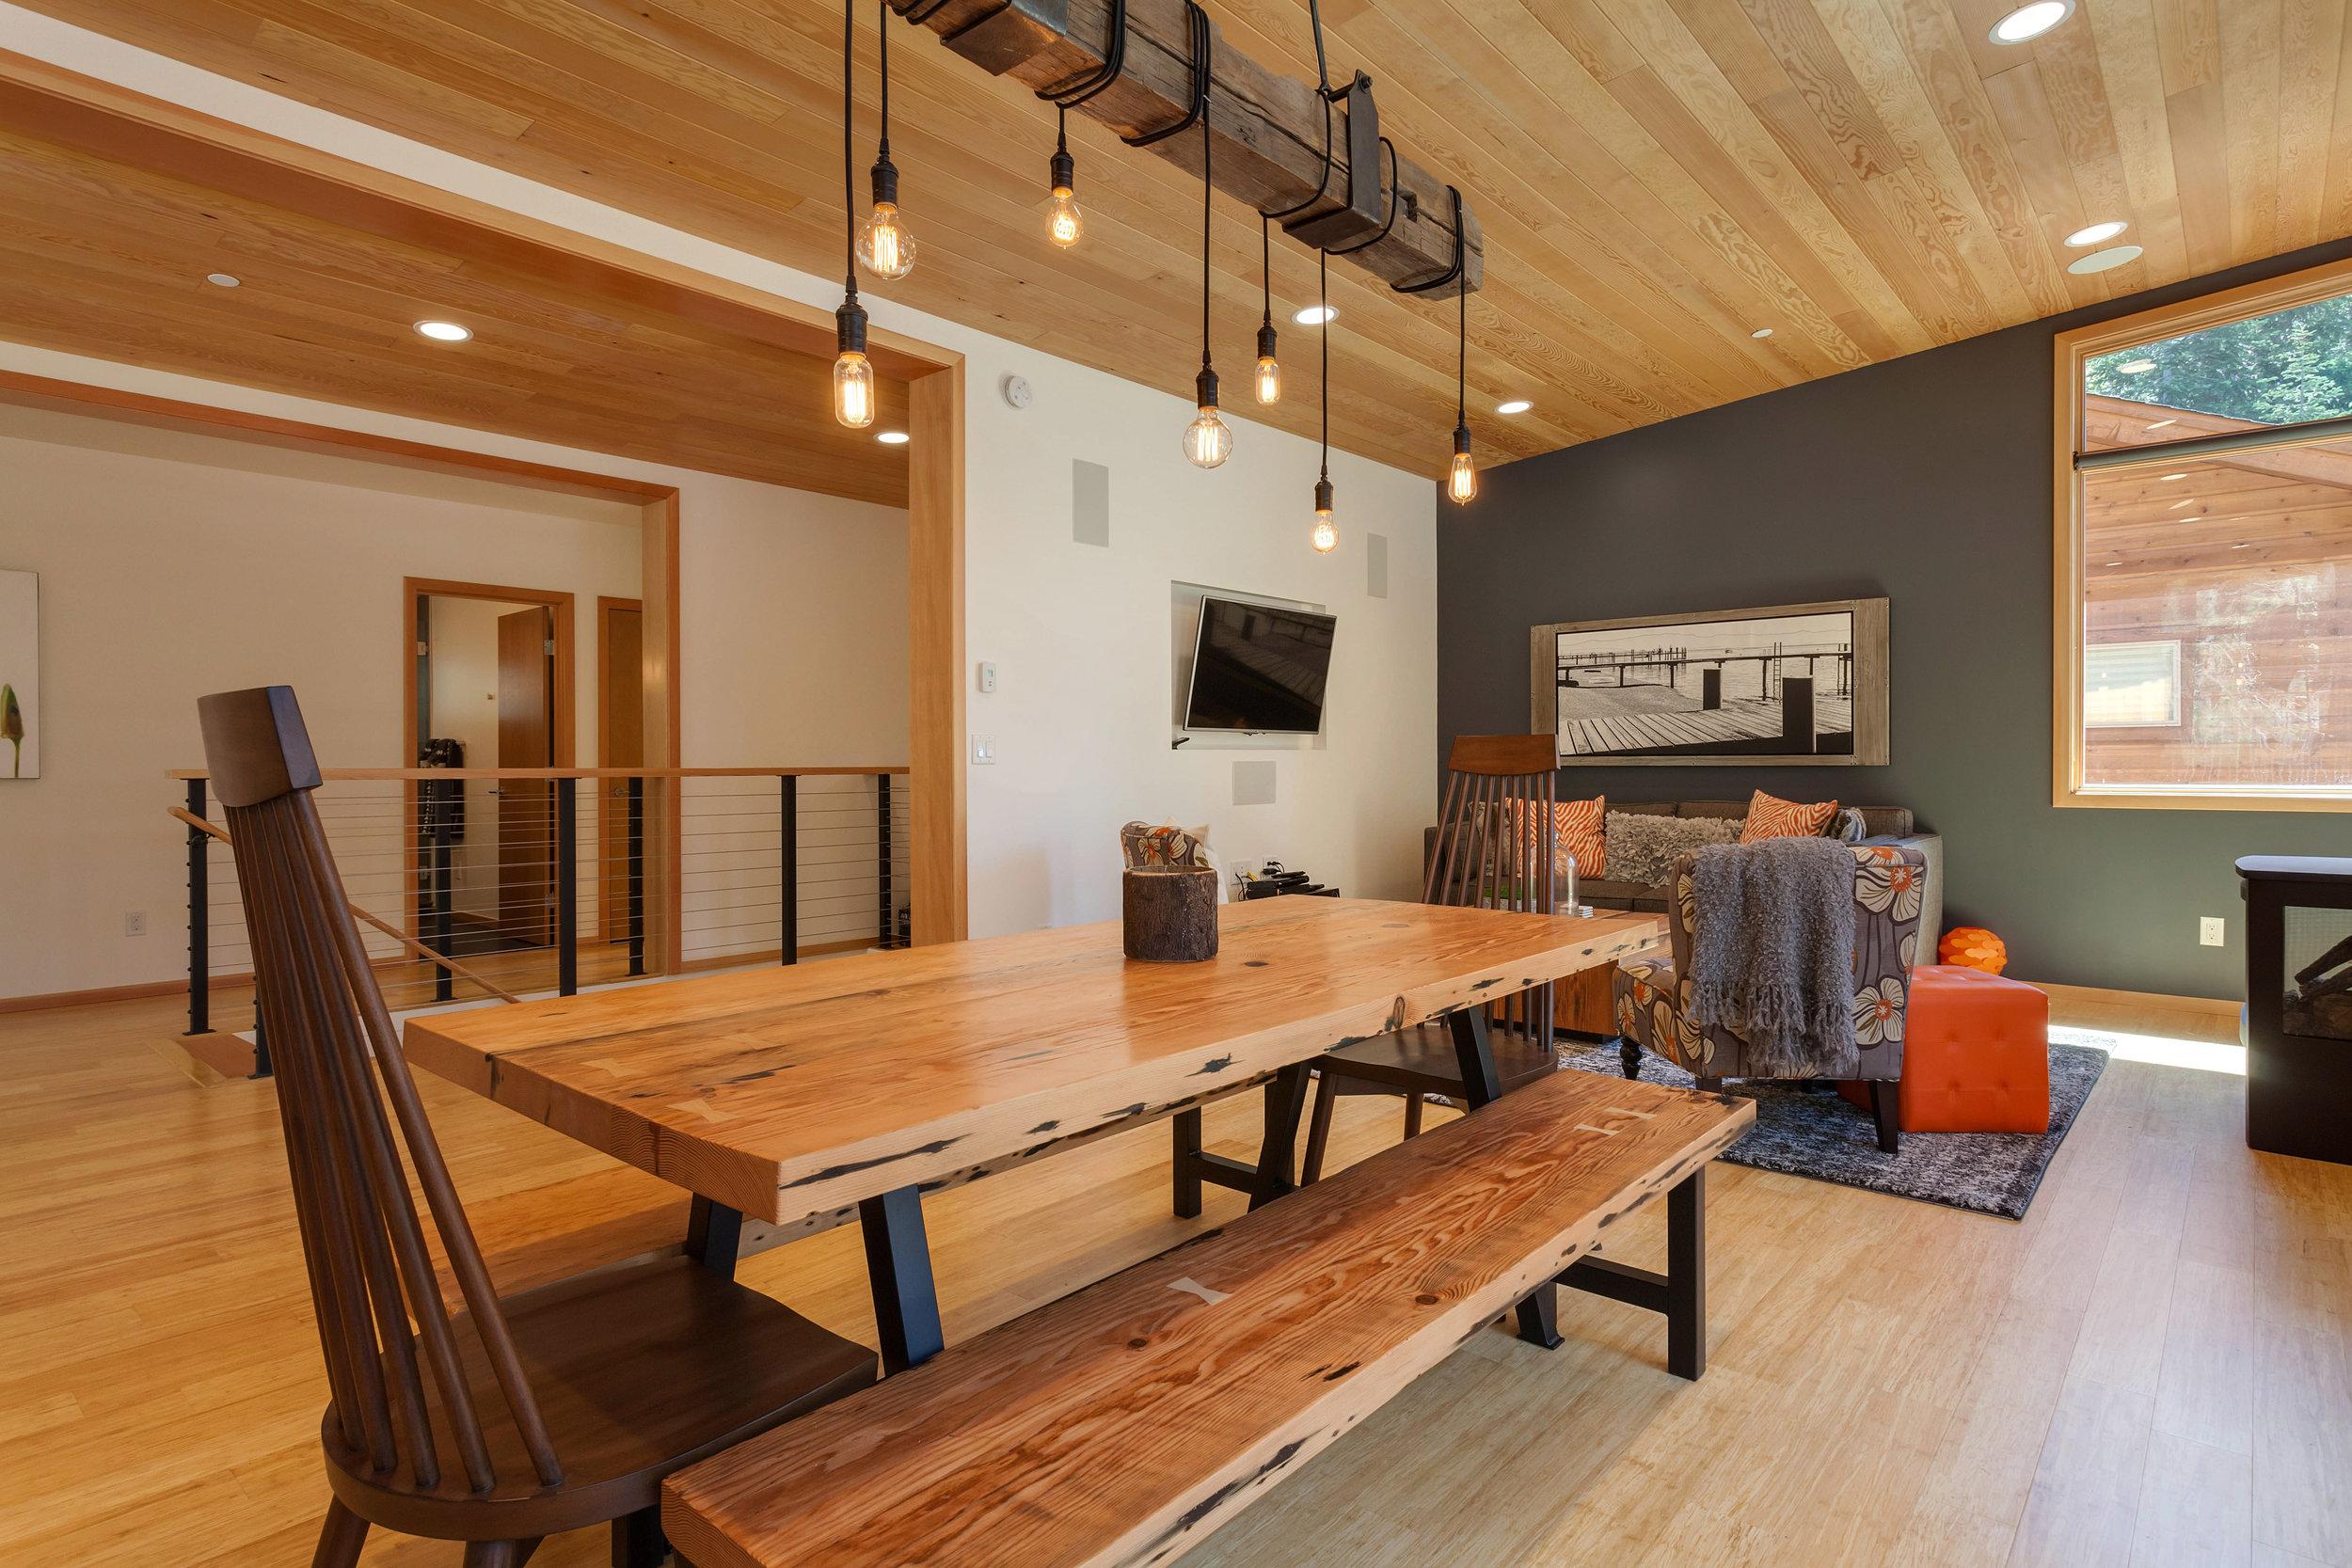 west shore - reclaimed wood table.jpg